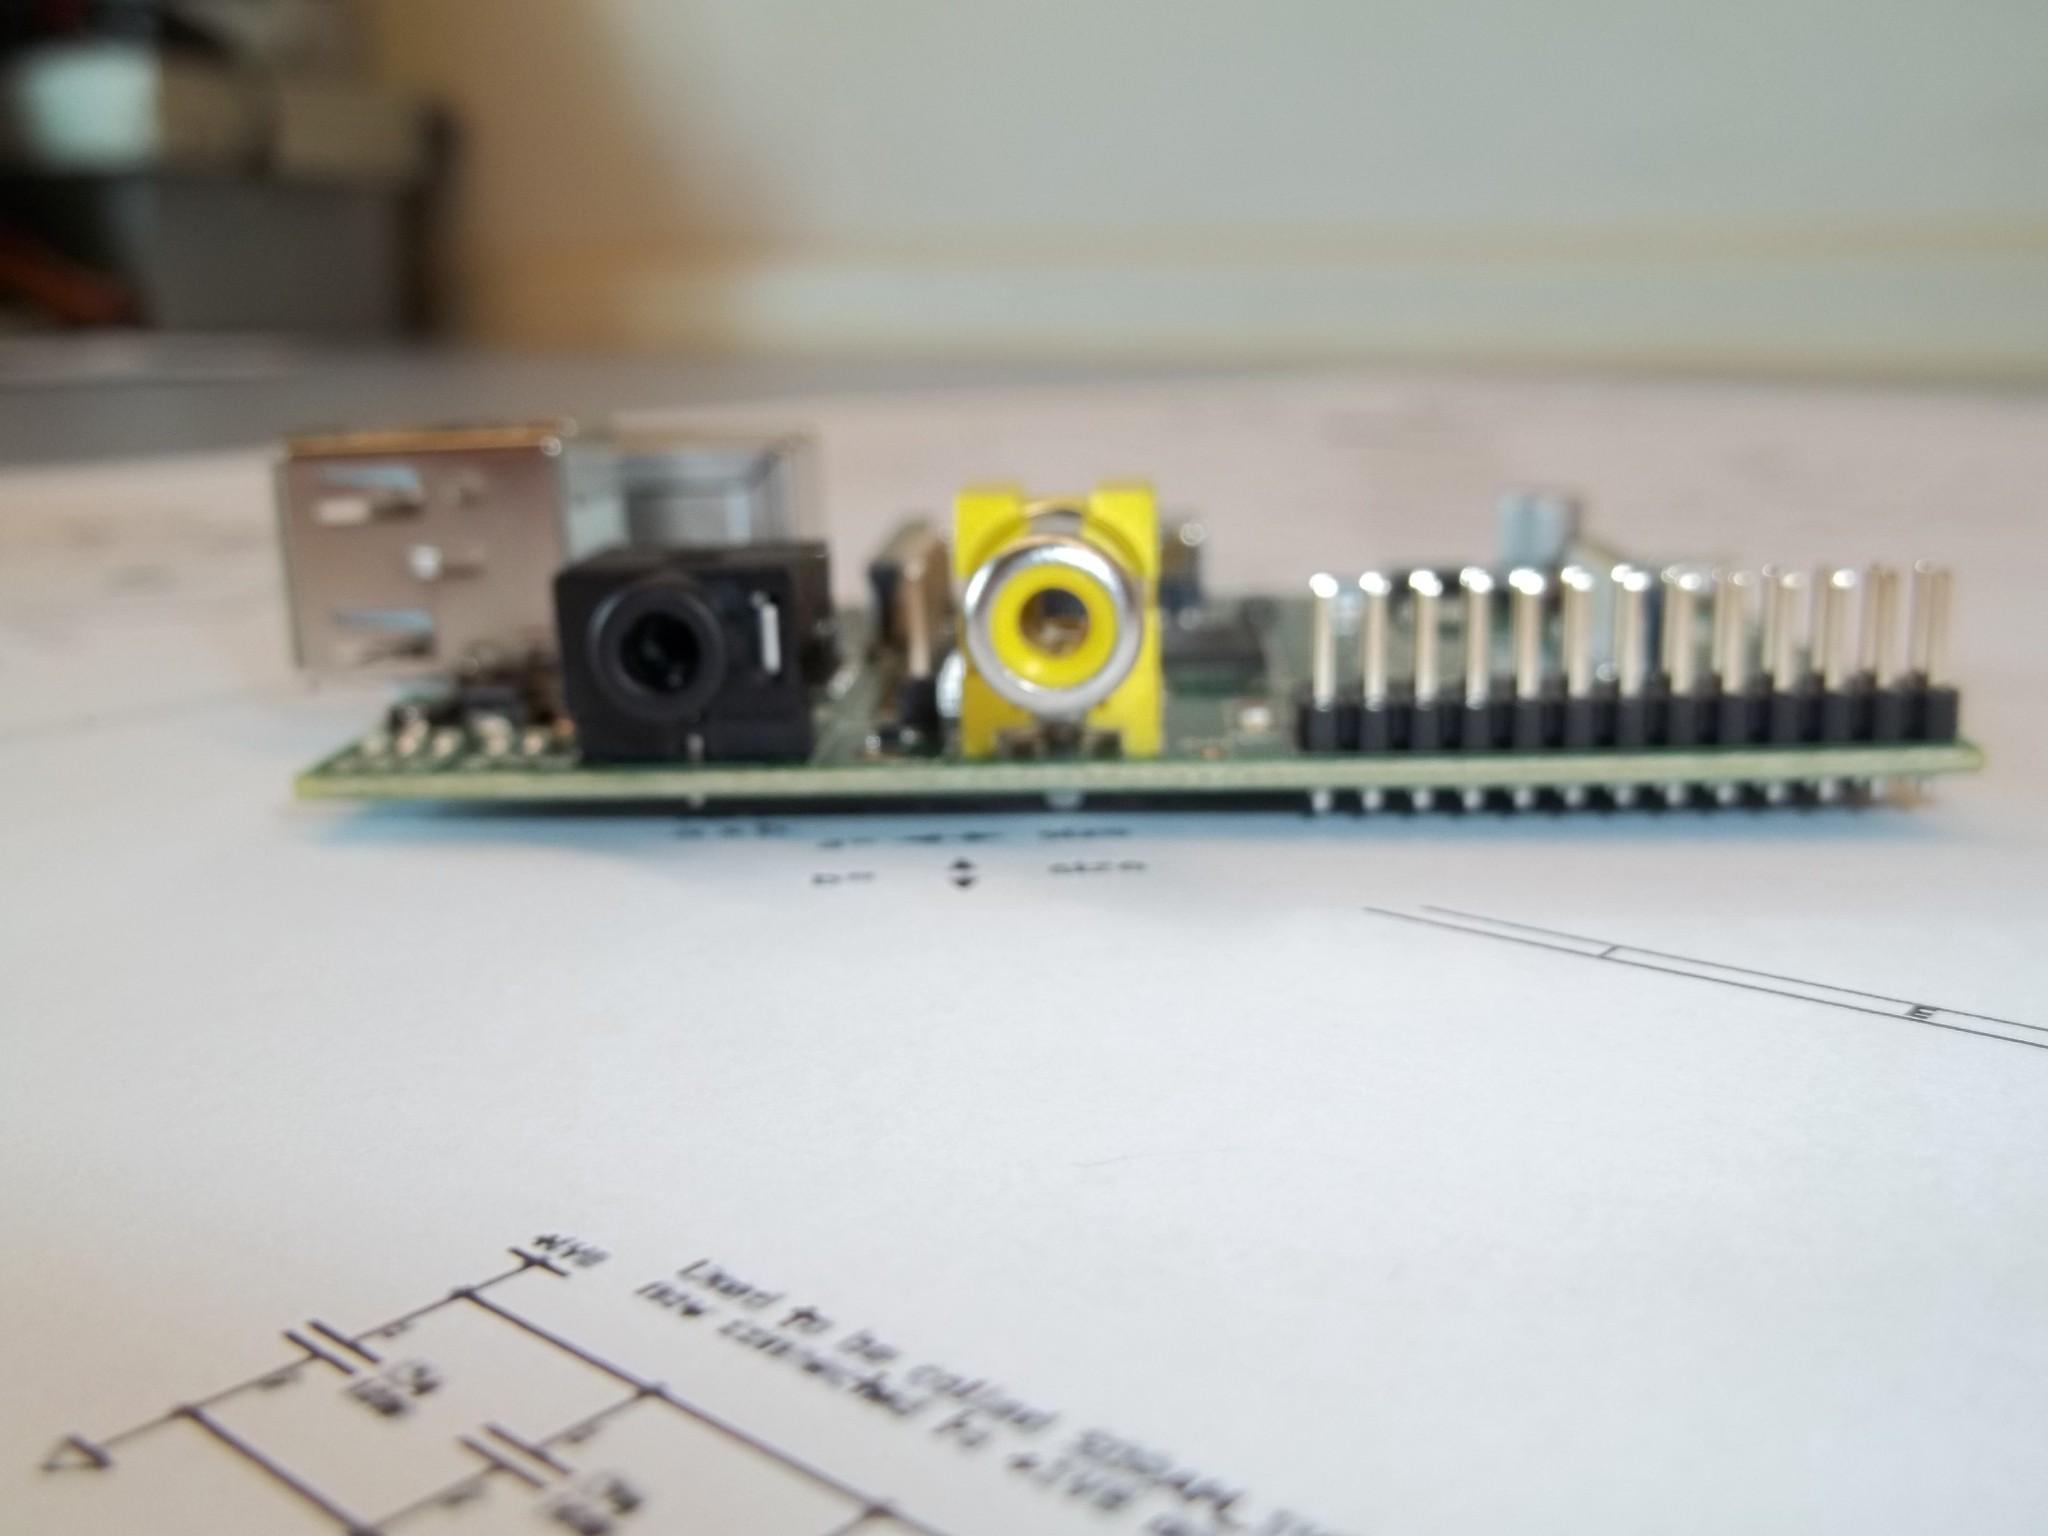 Photo: varie viste della Raspberry Pi OUT Audio - OUT Video RCA - GPIO